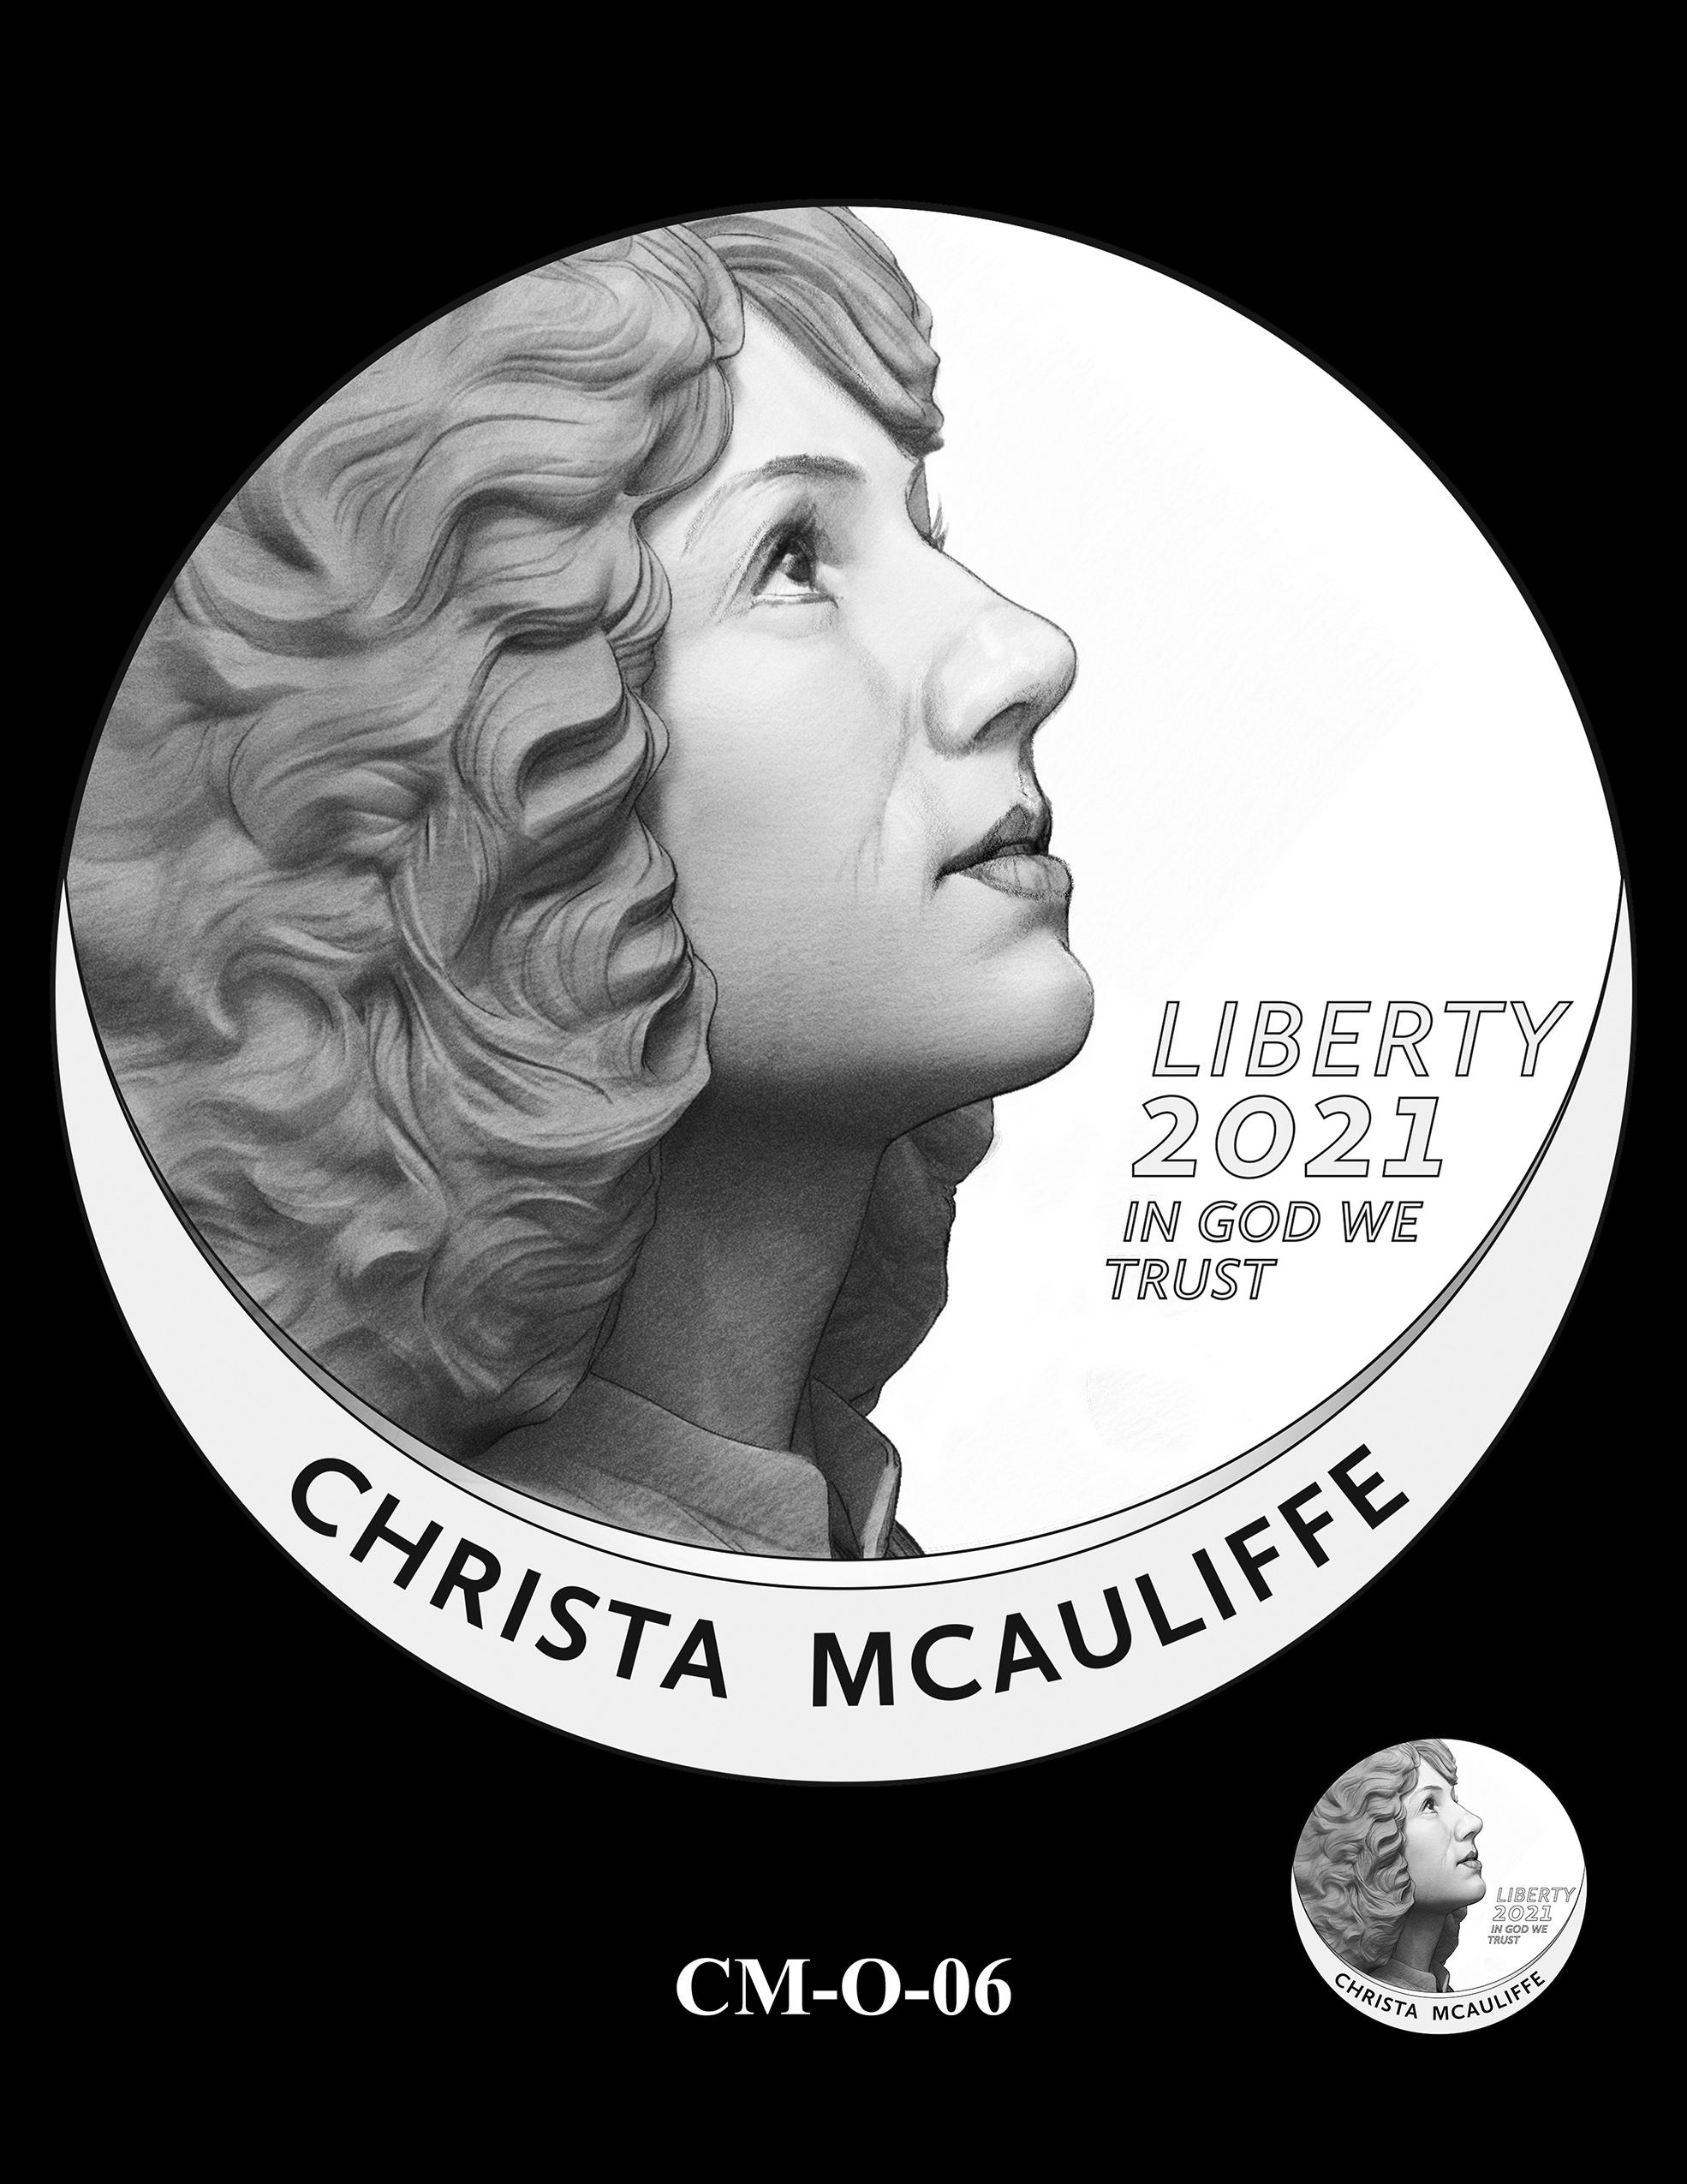 CM-O-06 -- 2021 Christa McAuliffe Commemorative Coin